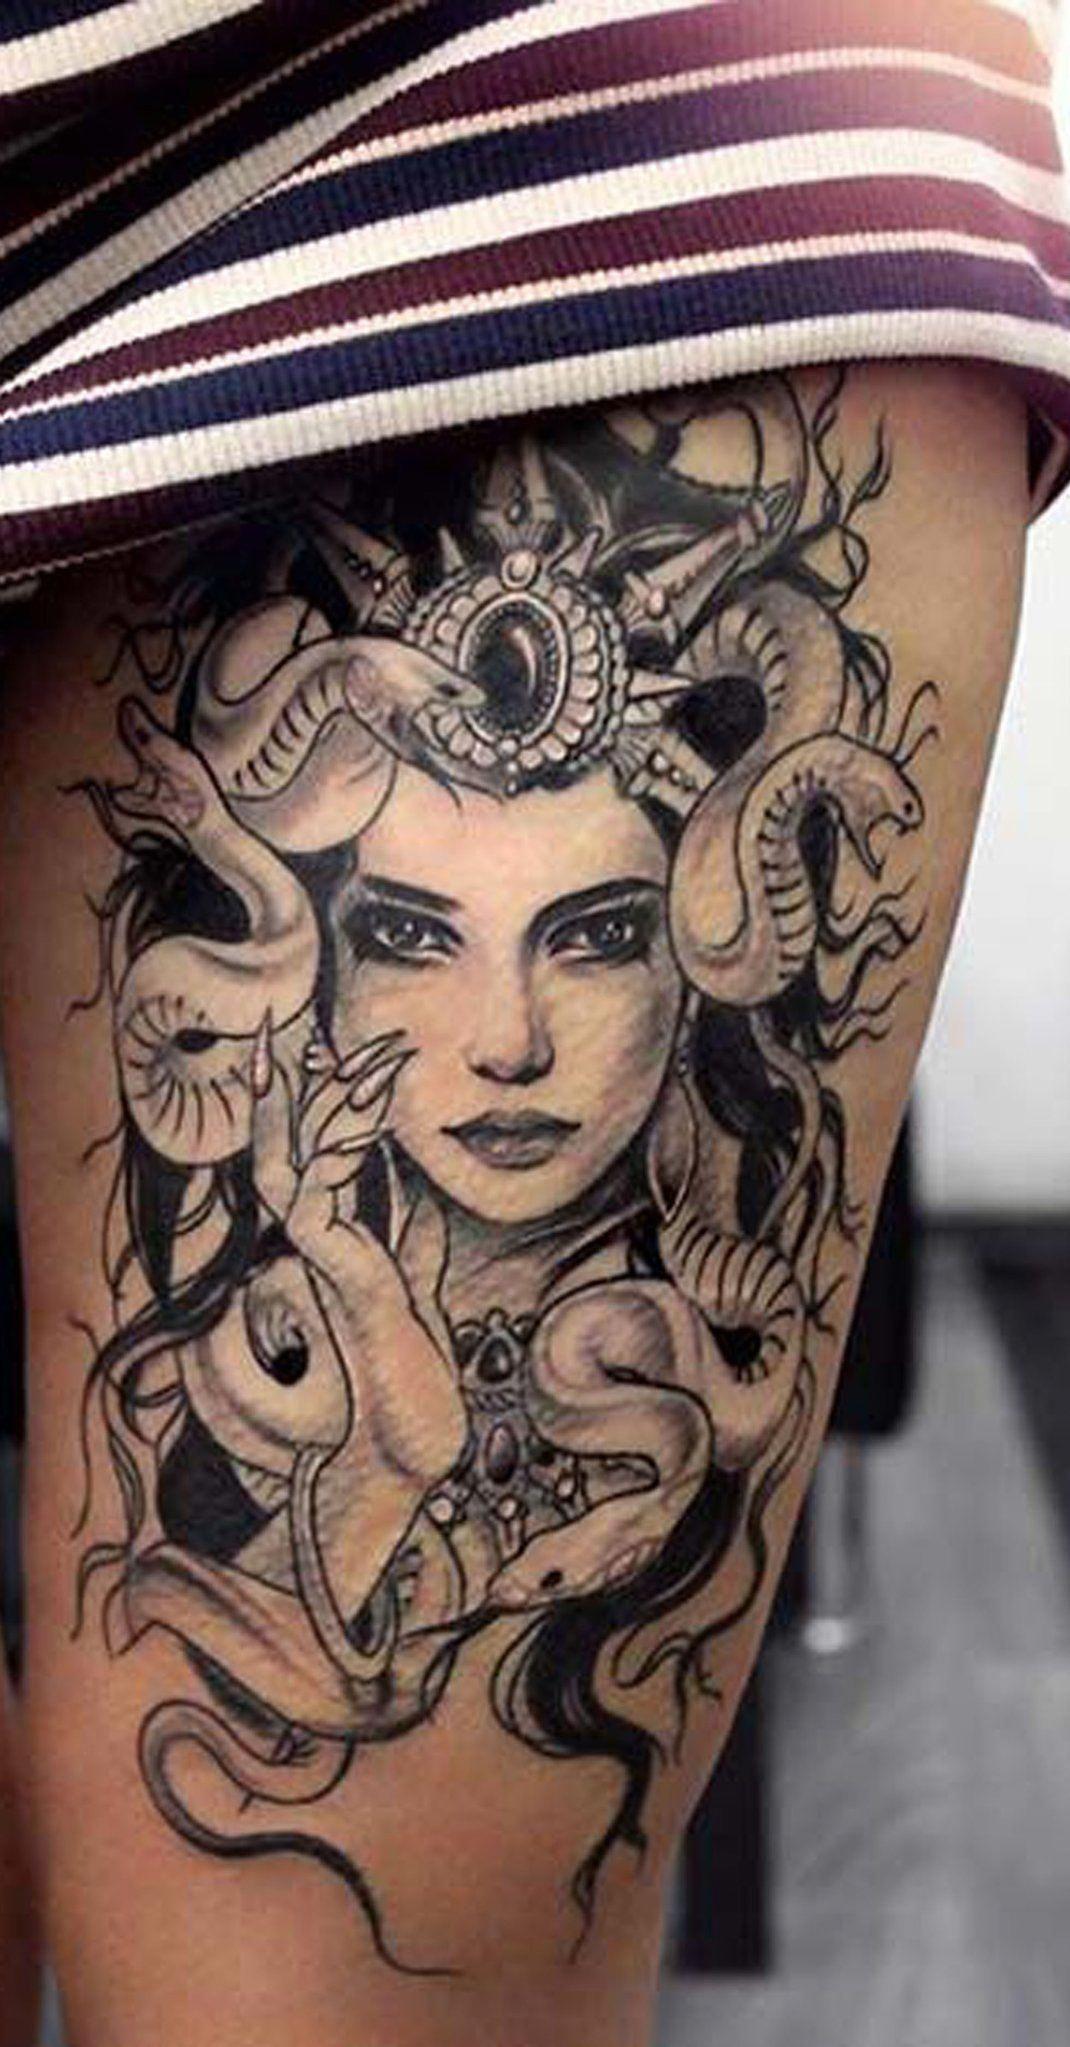 Cool Unique Thigh Tattoo Ideas for Women Medusa Head